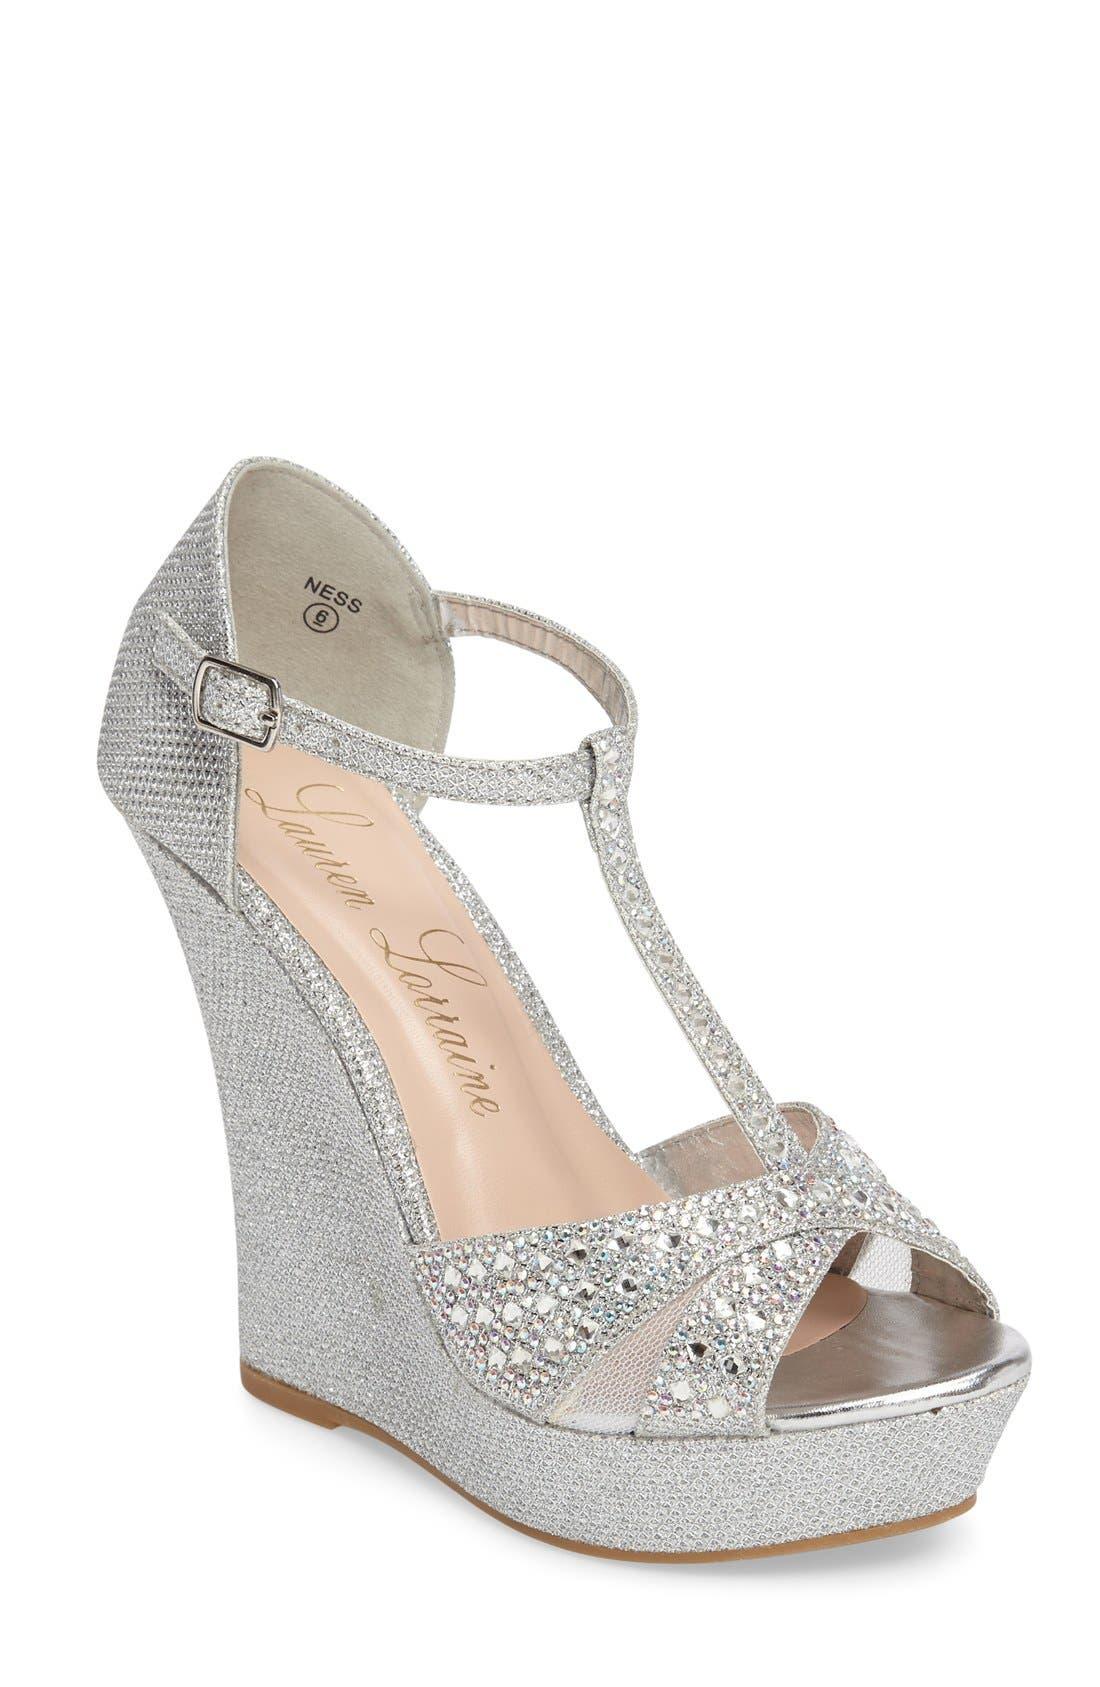 Main Image - Lauren Lorraine Ness Crystal Embellished Wedge Sandal (Women)